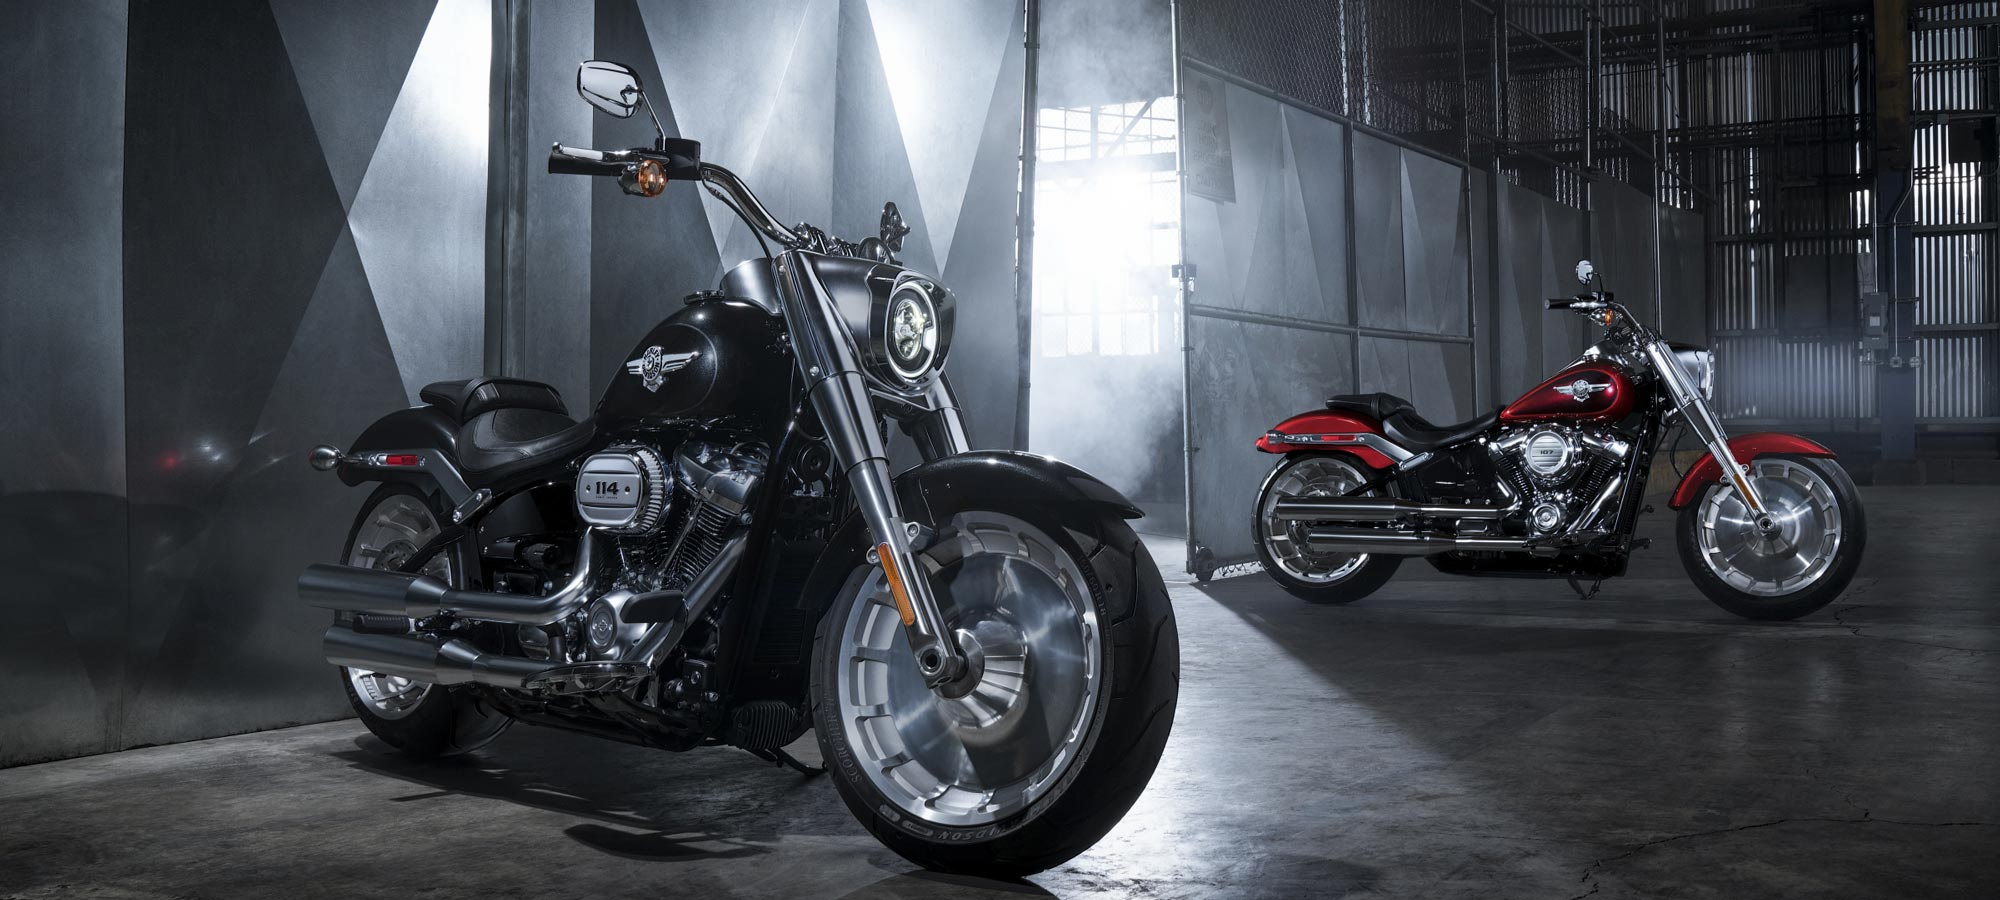 Harley-Davidson Fat Boy Mods